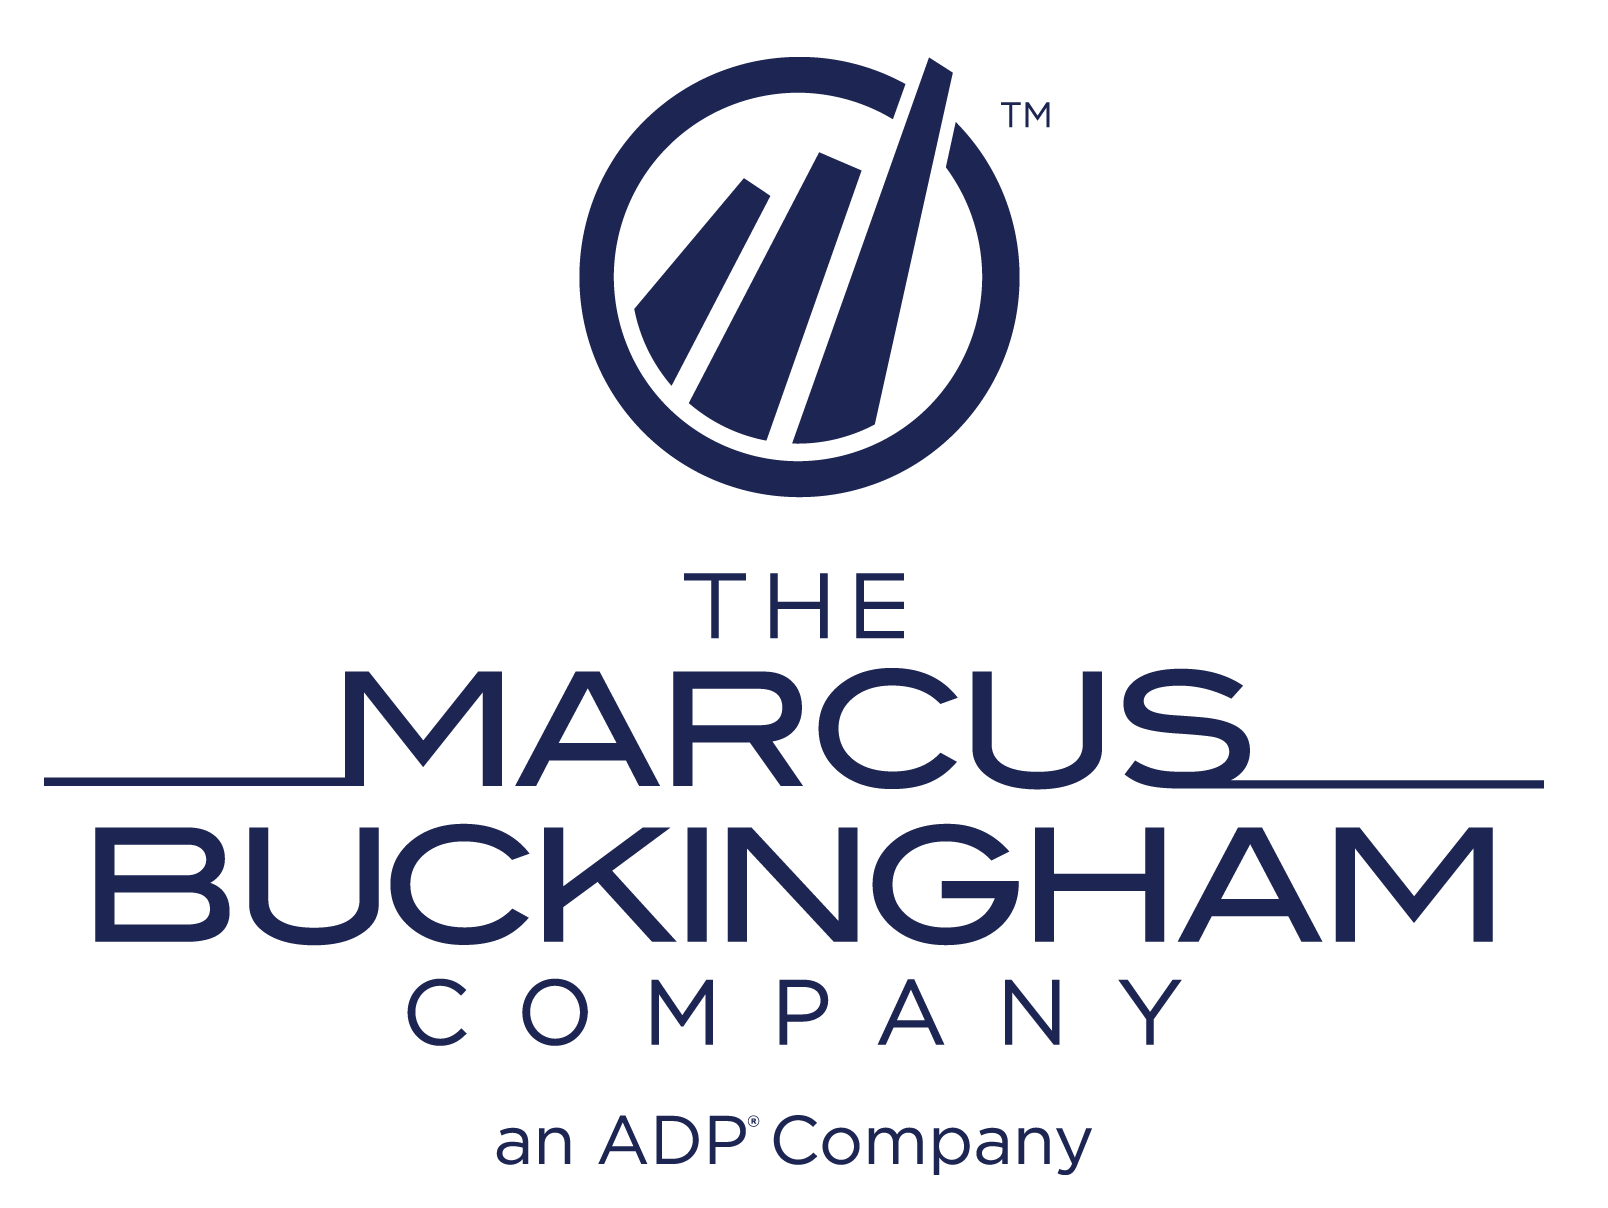 The Marcus Buckingham Company, an ADP company logo